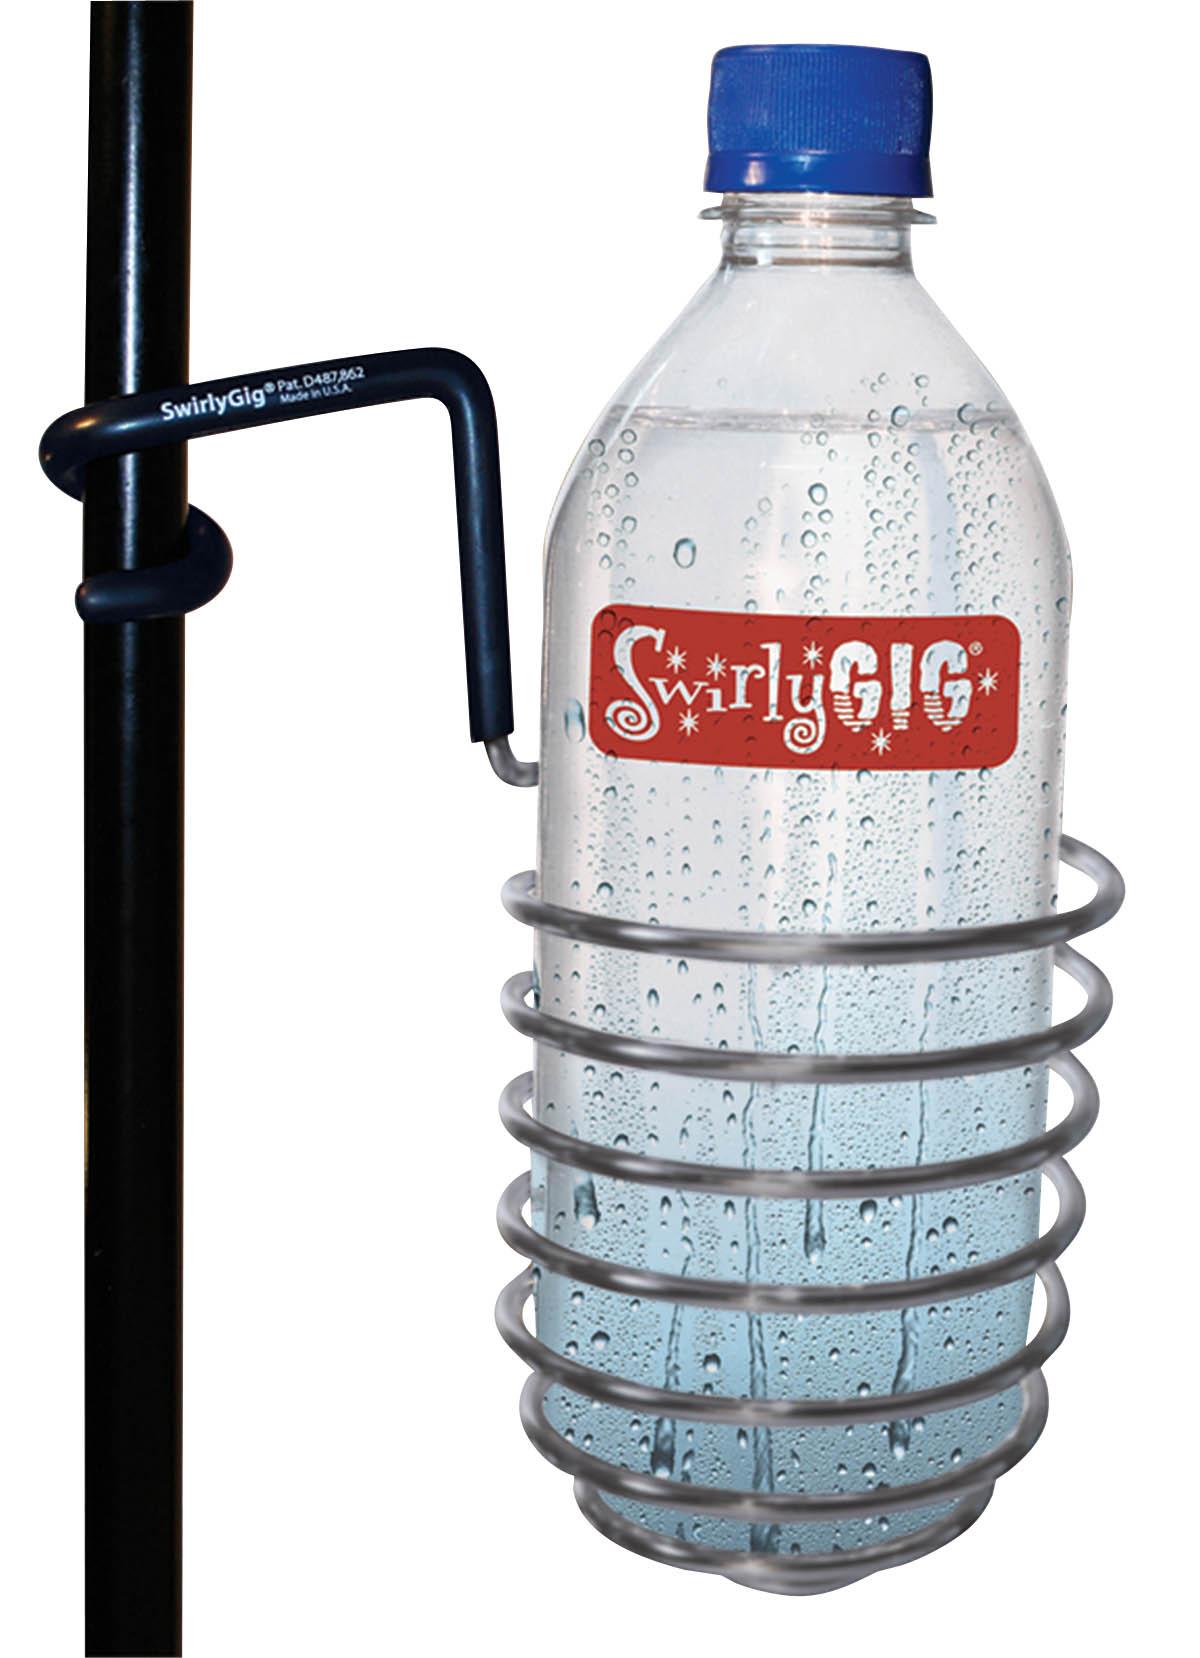 The Original SwirlyGig - Drink Holder 1/2″ Tubing: Accessory